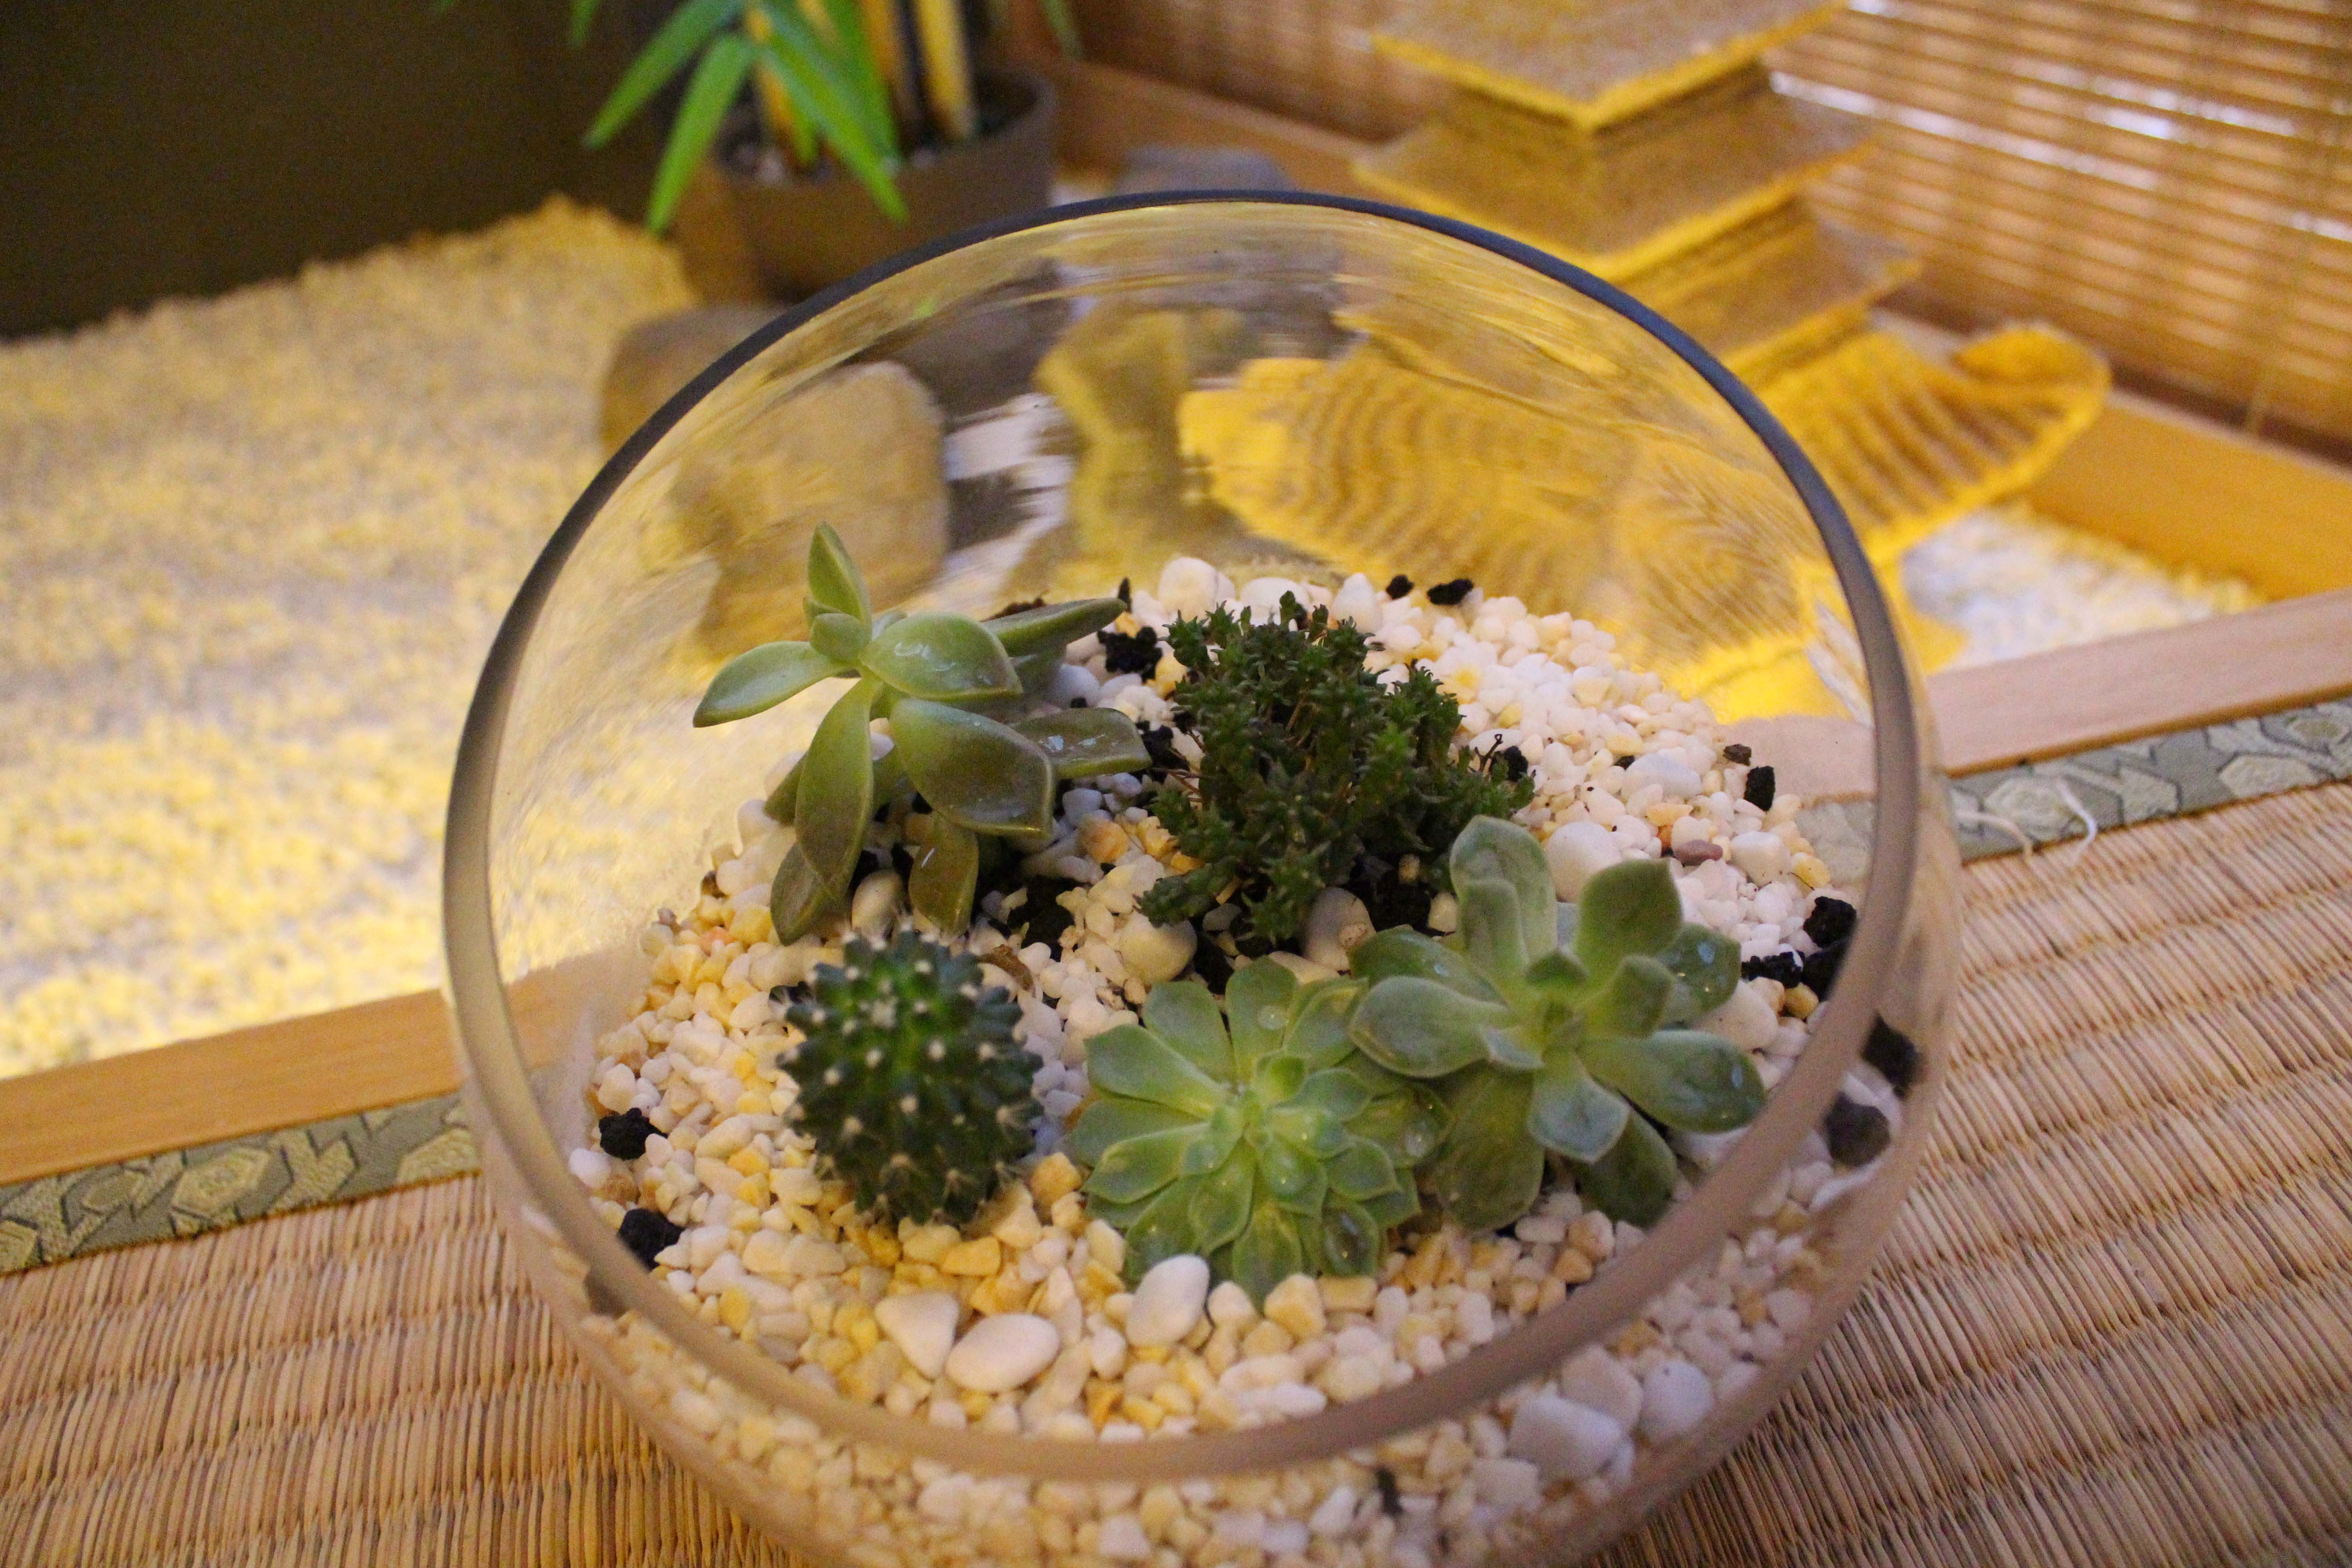 mother's day gift - terrarium